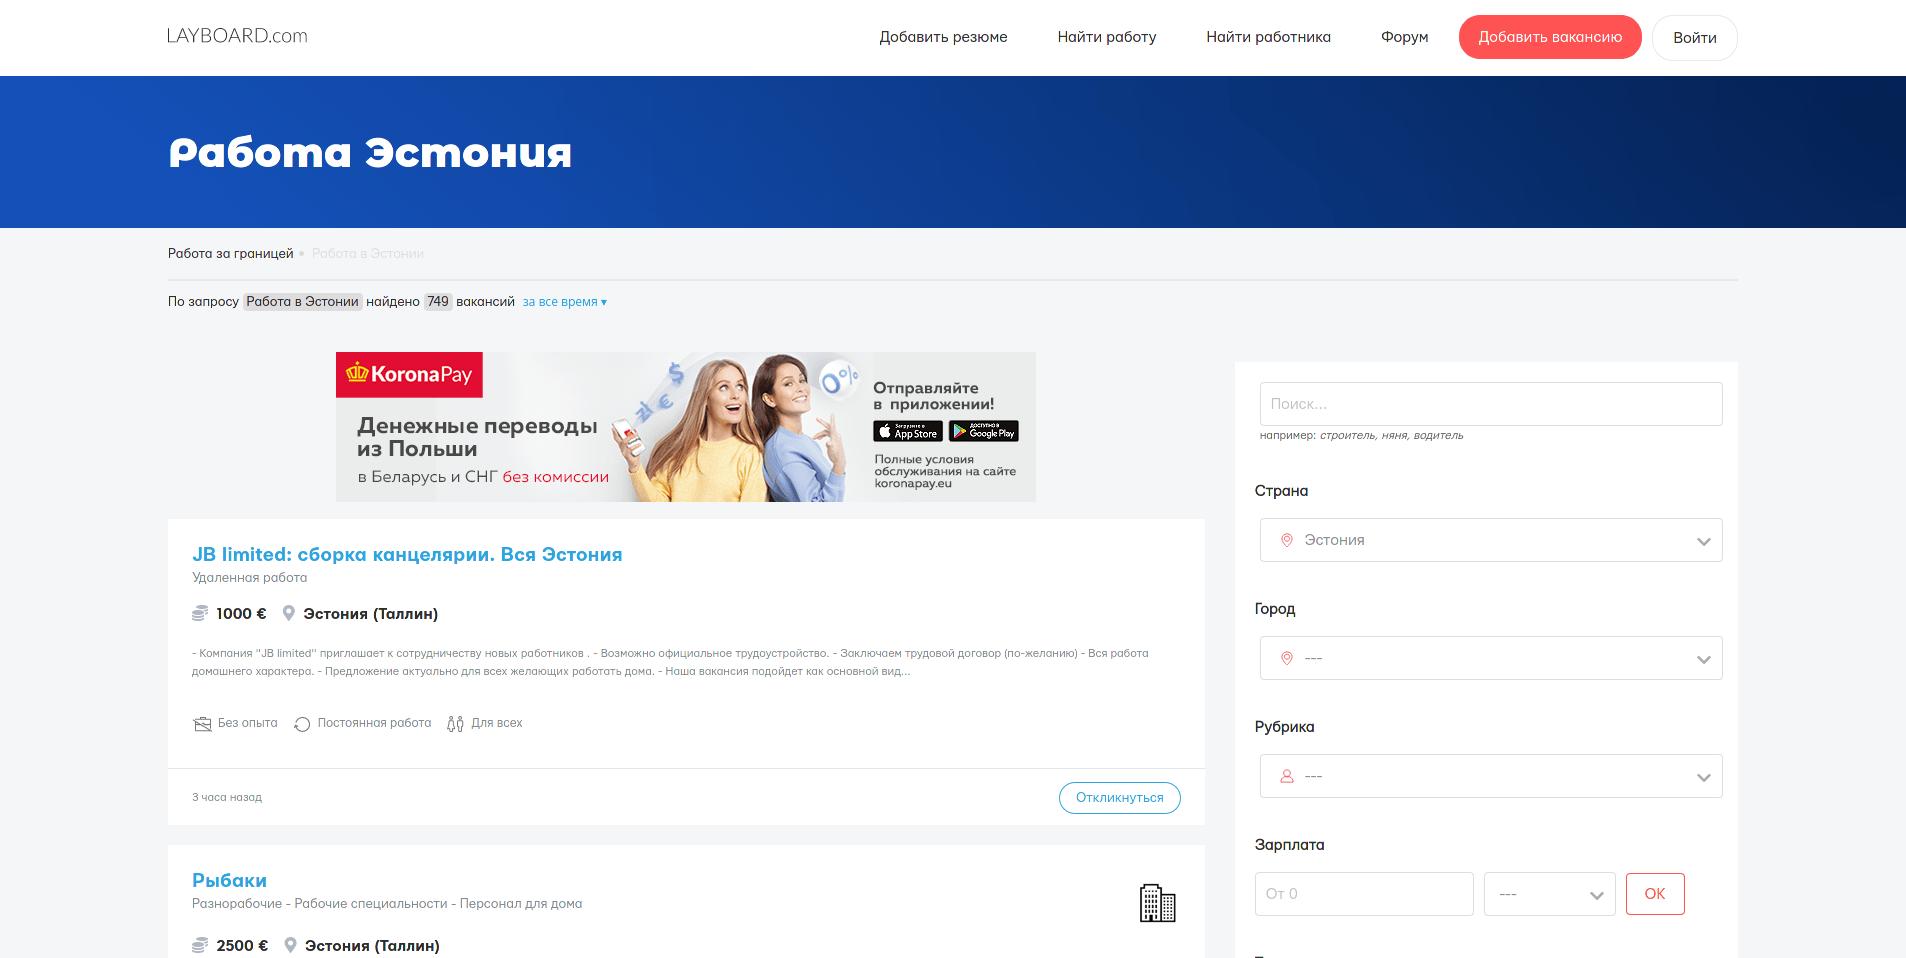 Screenshot_2021-03-06 Работа в Эстонии Вакансии от 1100€ прямых работодателей в Эстонии - Layboard.png